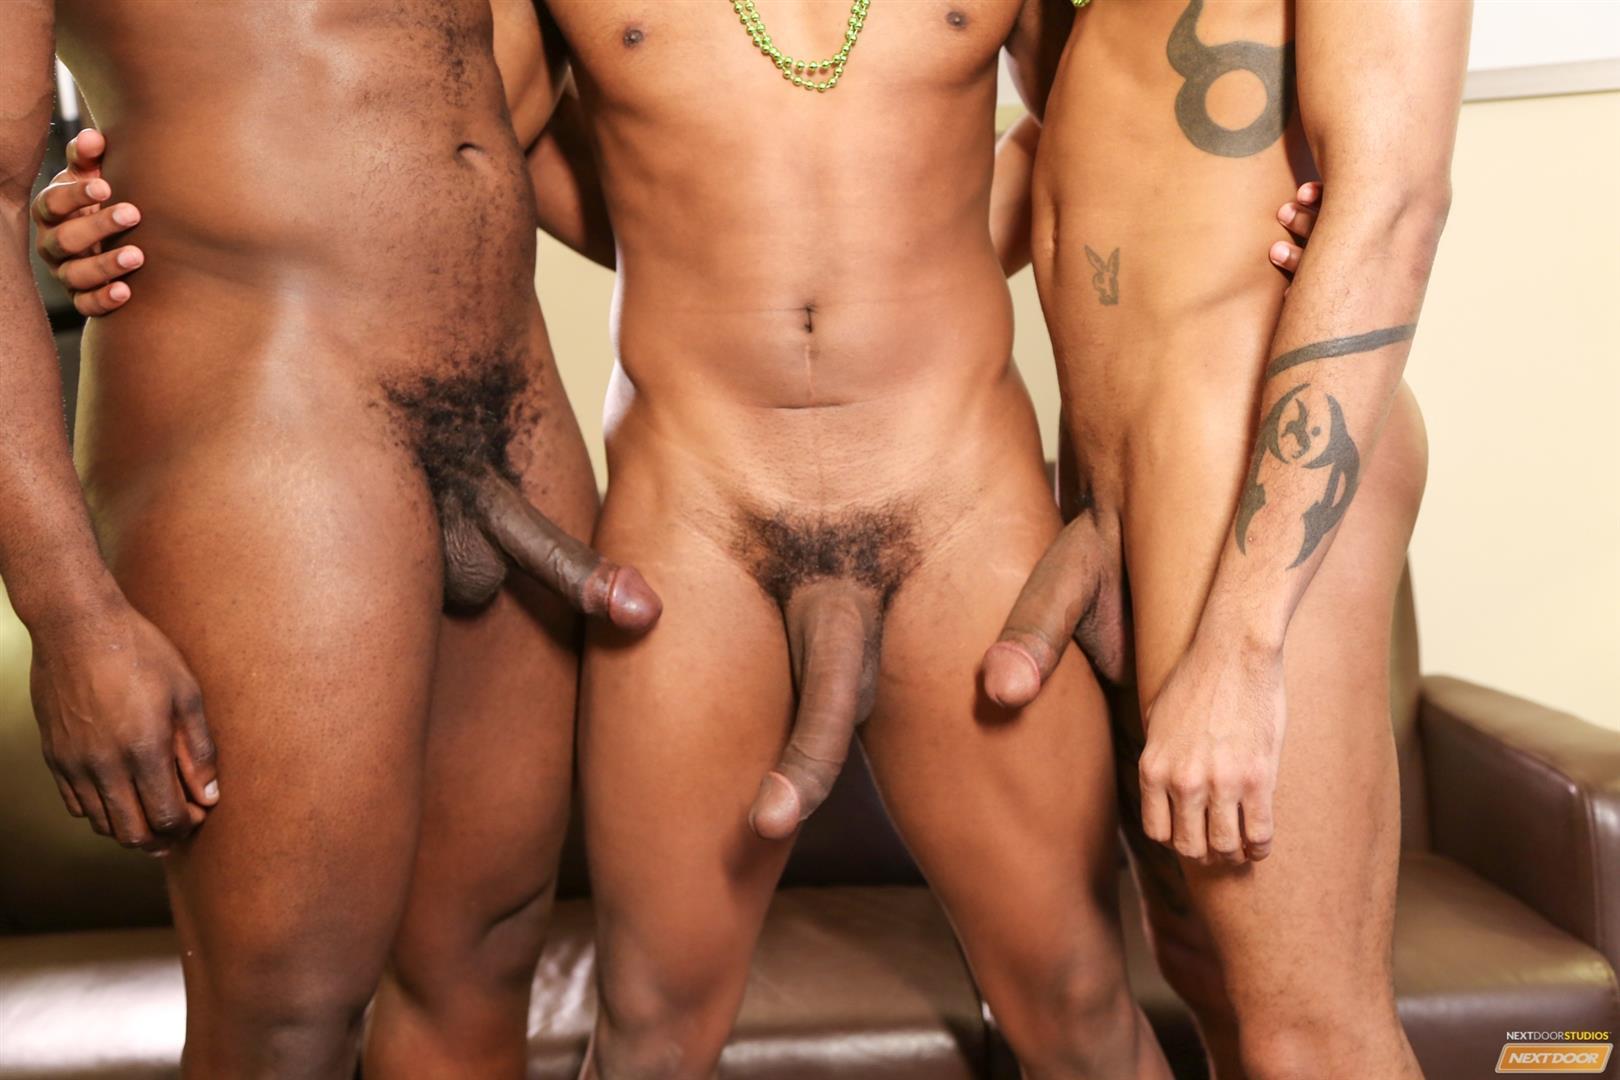 Next-Door-Ebony-Nubius-and-Jin-Powers-and-XL-Naked-Thugs-Threeway-Fucking-Amateur-Gay-Porn-06 Big Black Cock Threeway Suck and Fuck Thug Fest